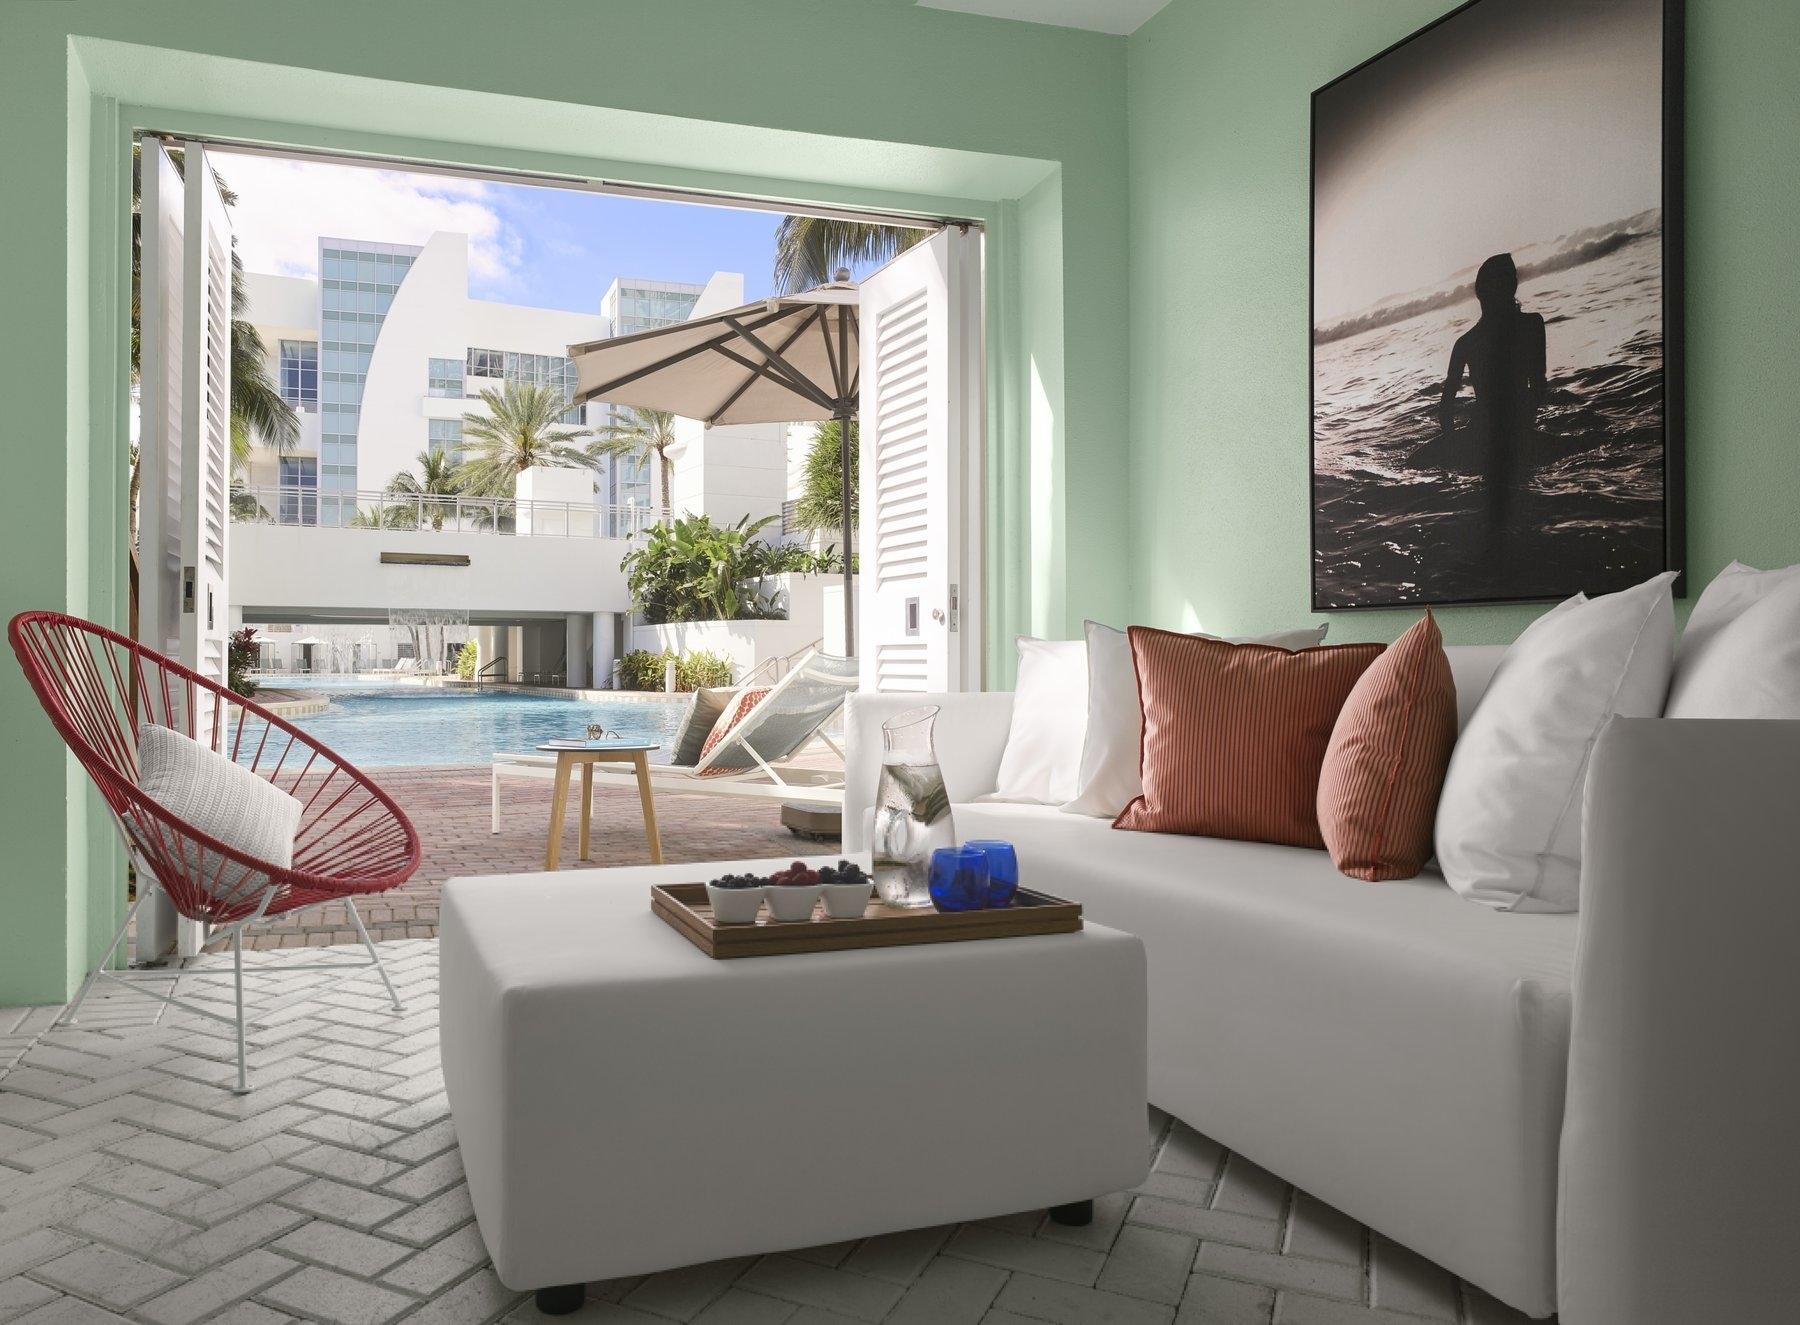 Cabana - The Diplomat Beach Resort, Miami, FL